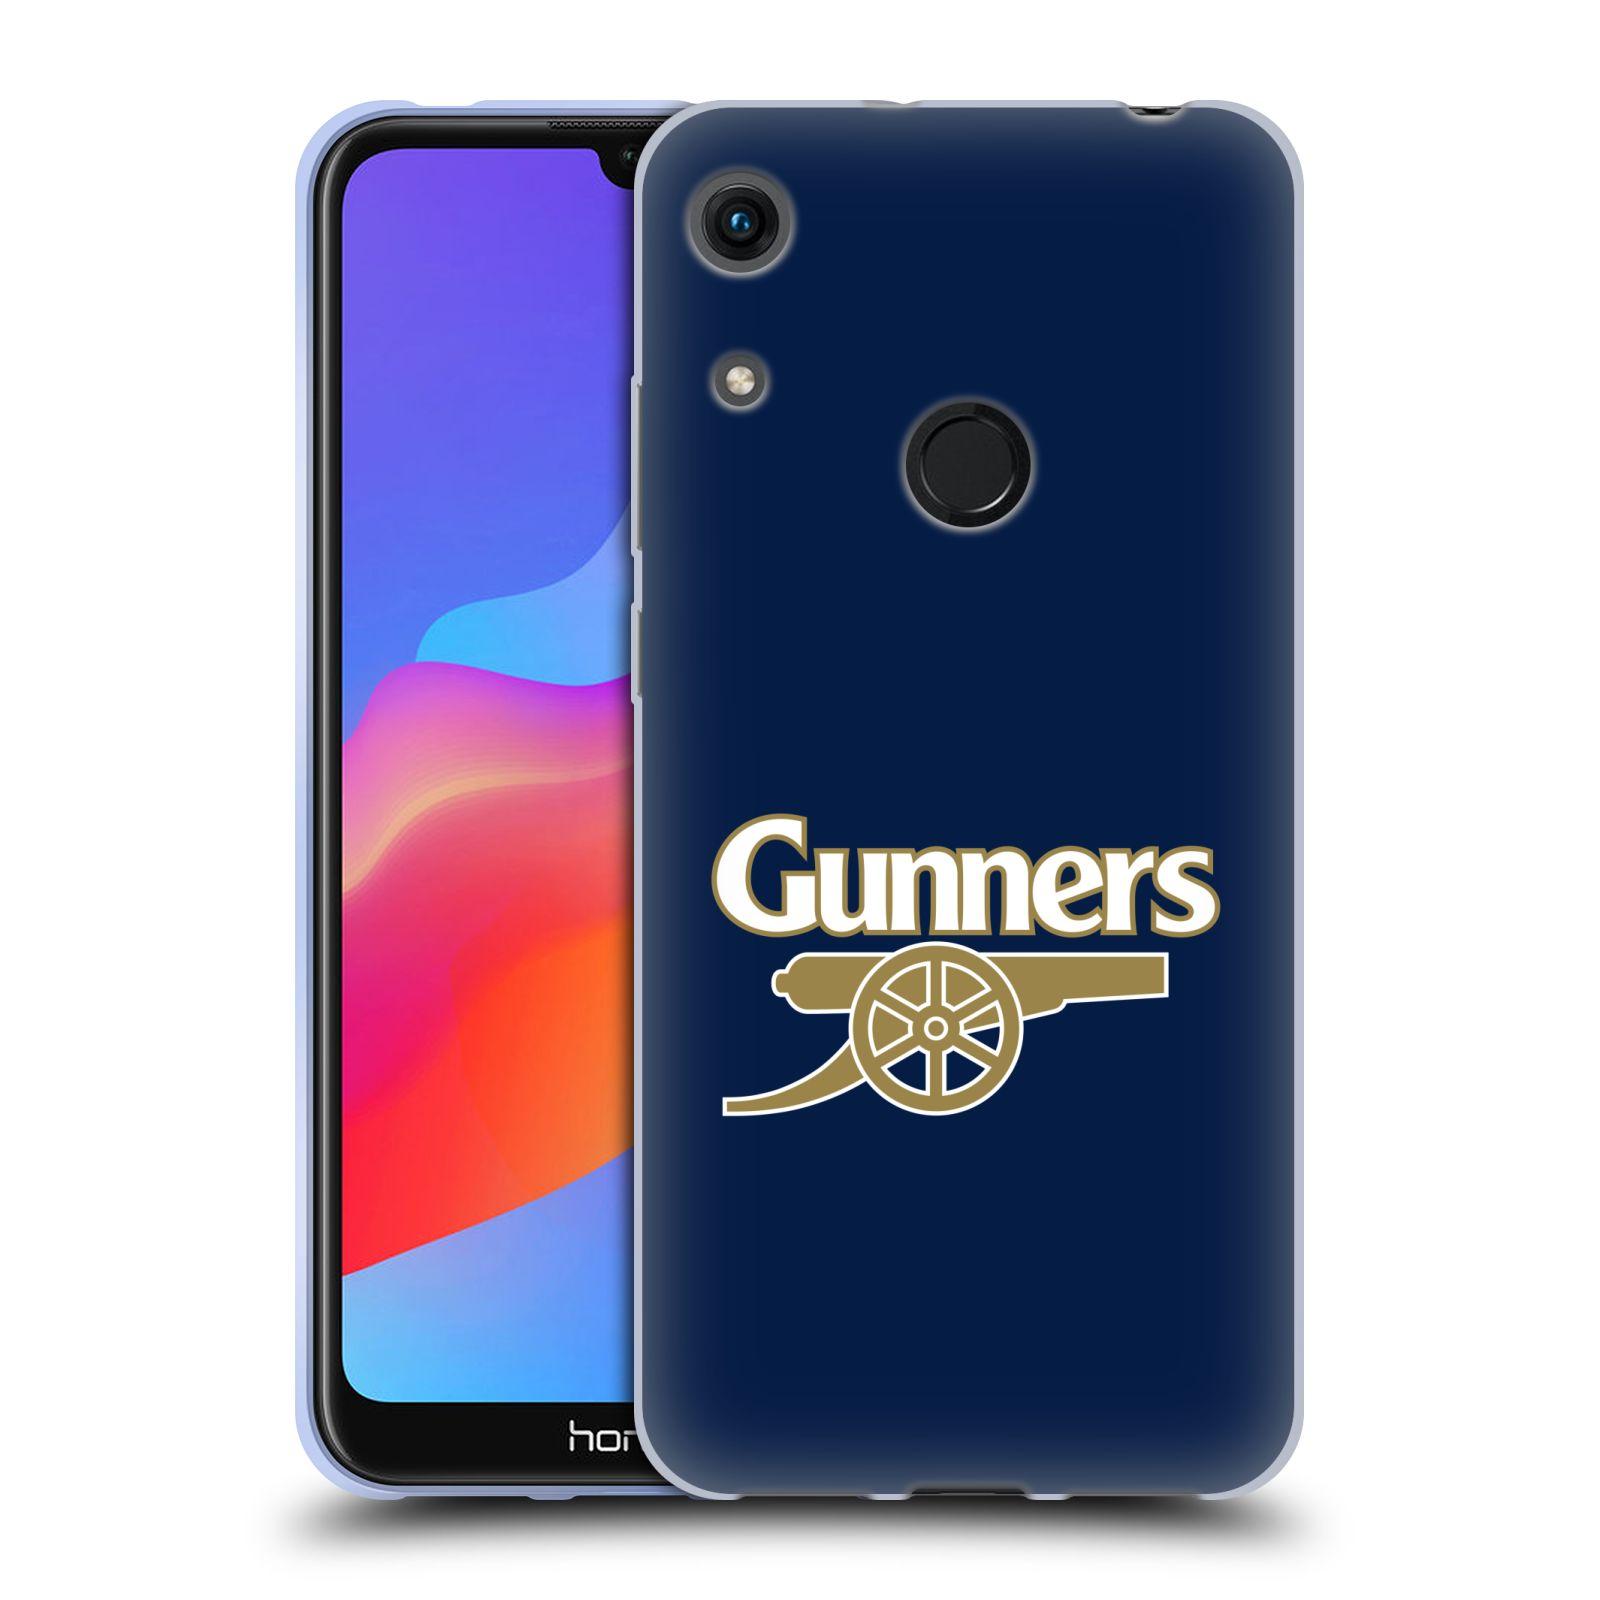 Silikonové pouzdro na mobil Honor 8A - Head Case - Arsenal FC - Gunners